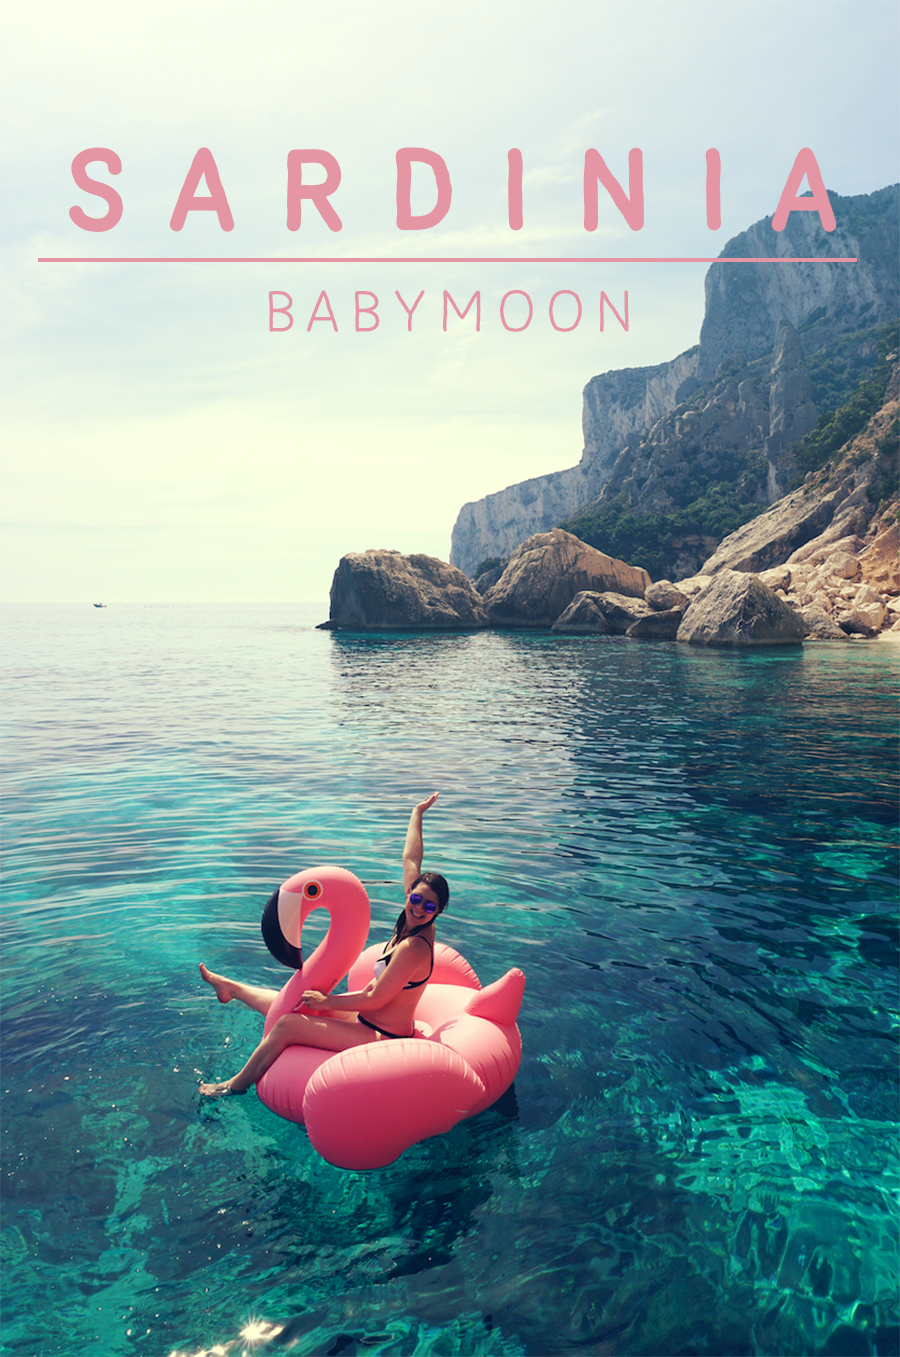 Babymoon Sardinia